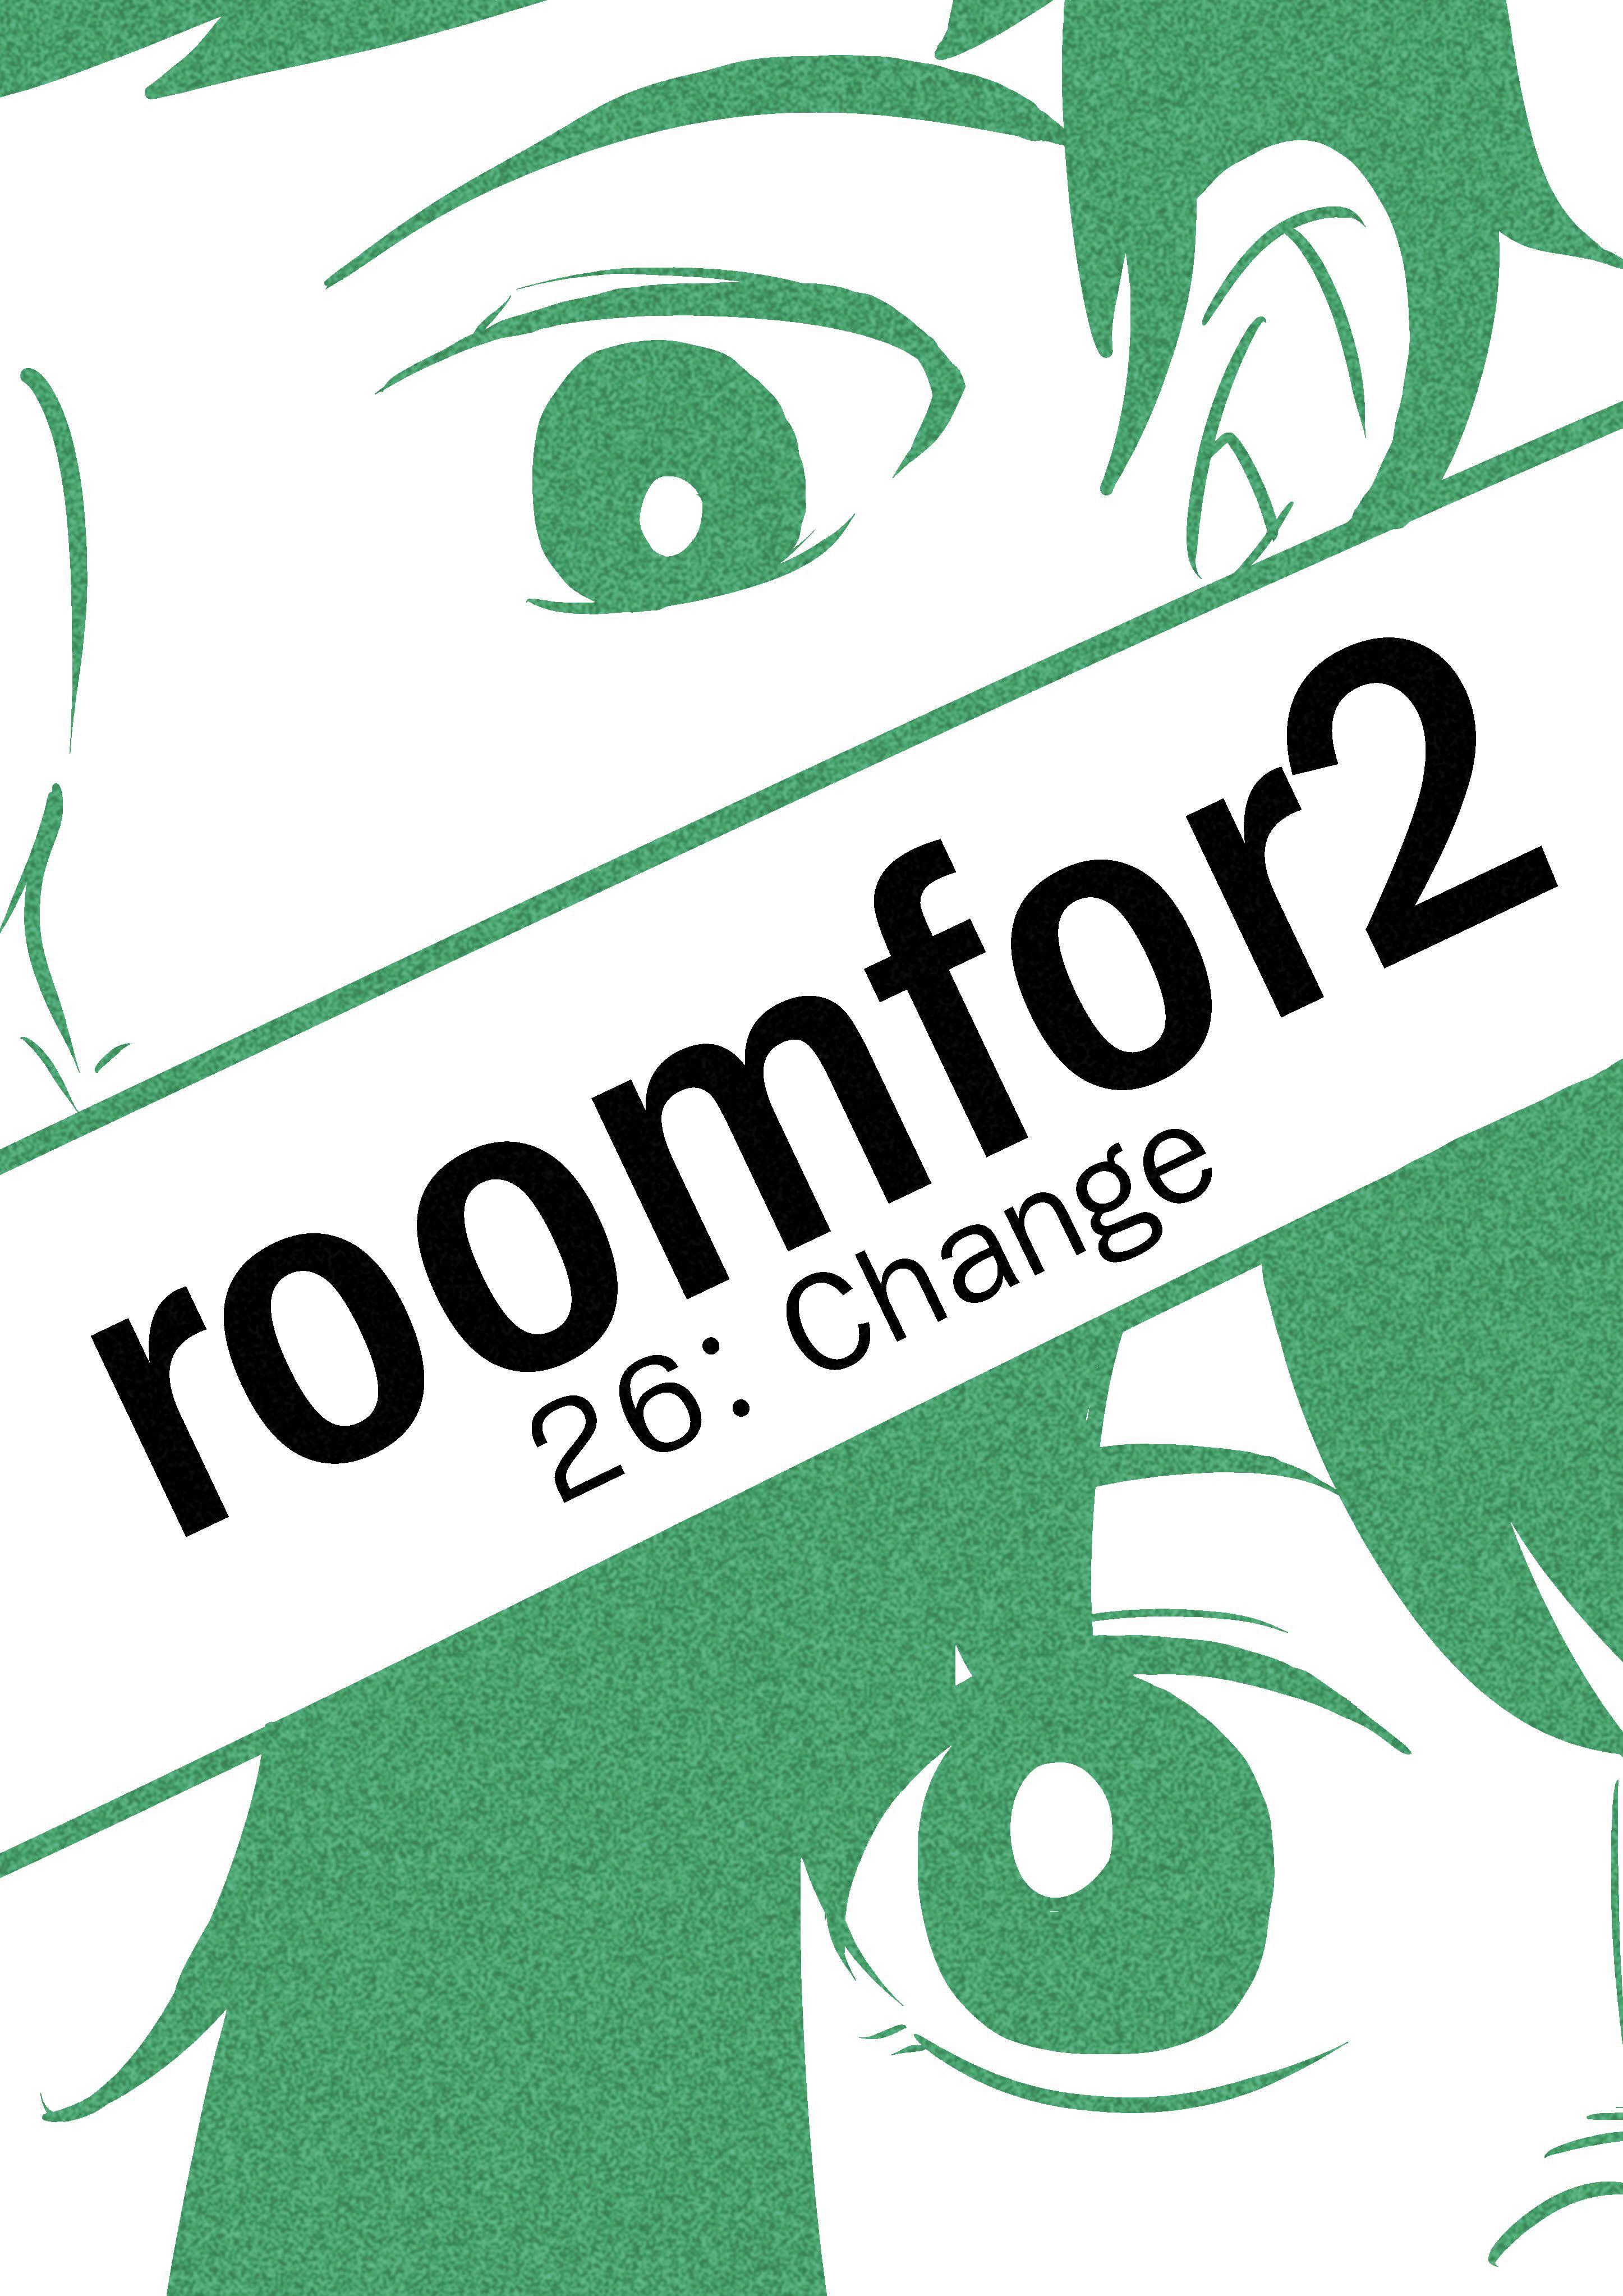 26: Change